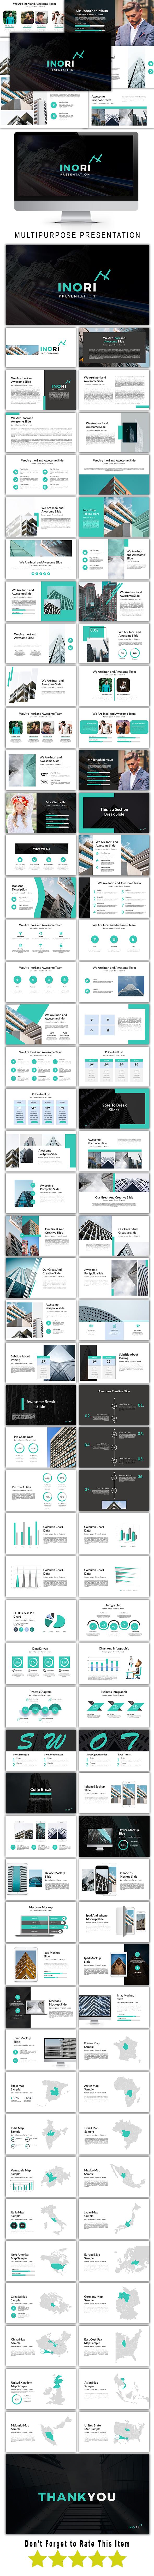 Inori Multipurpose Keynote Template - Keynote Templates Presentation Templates